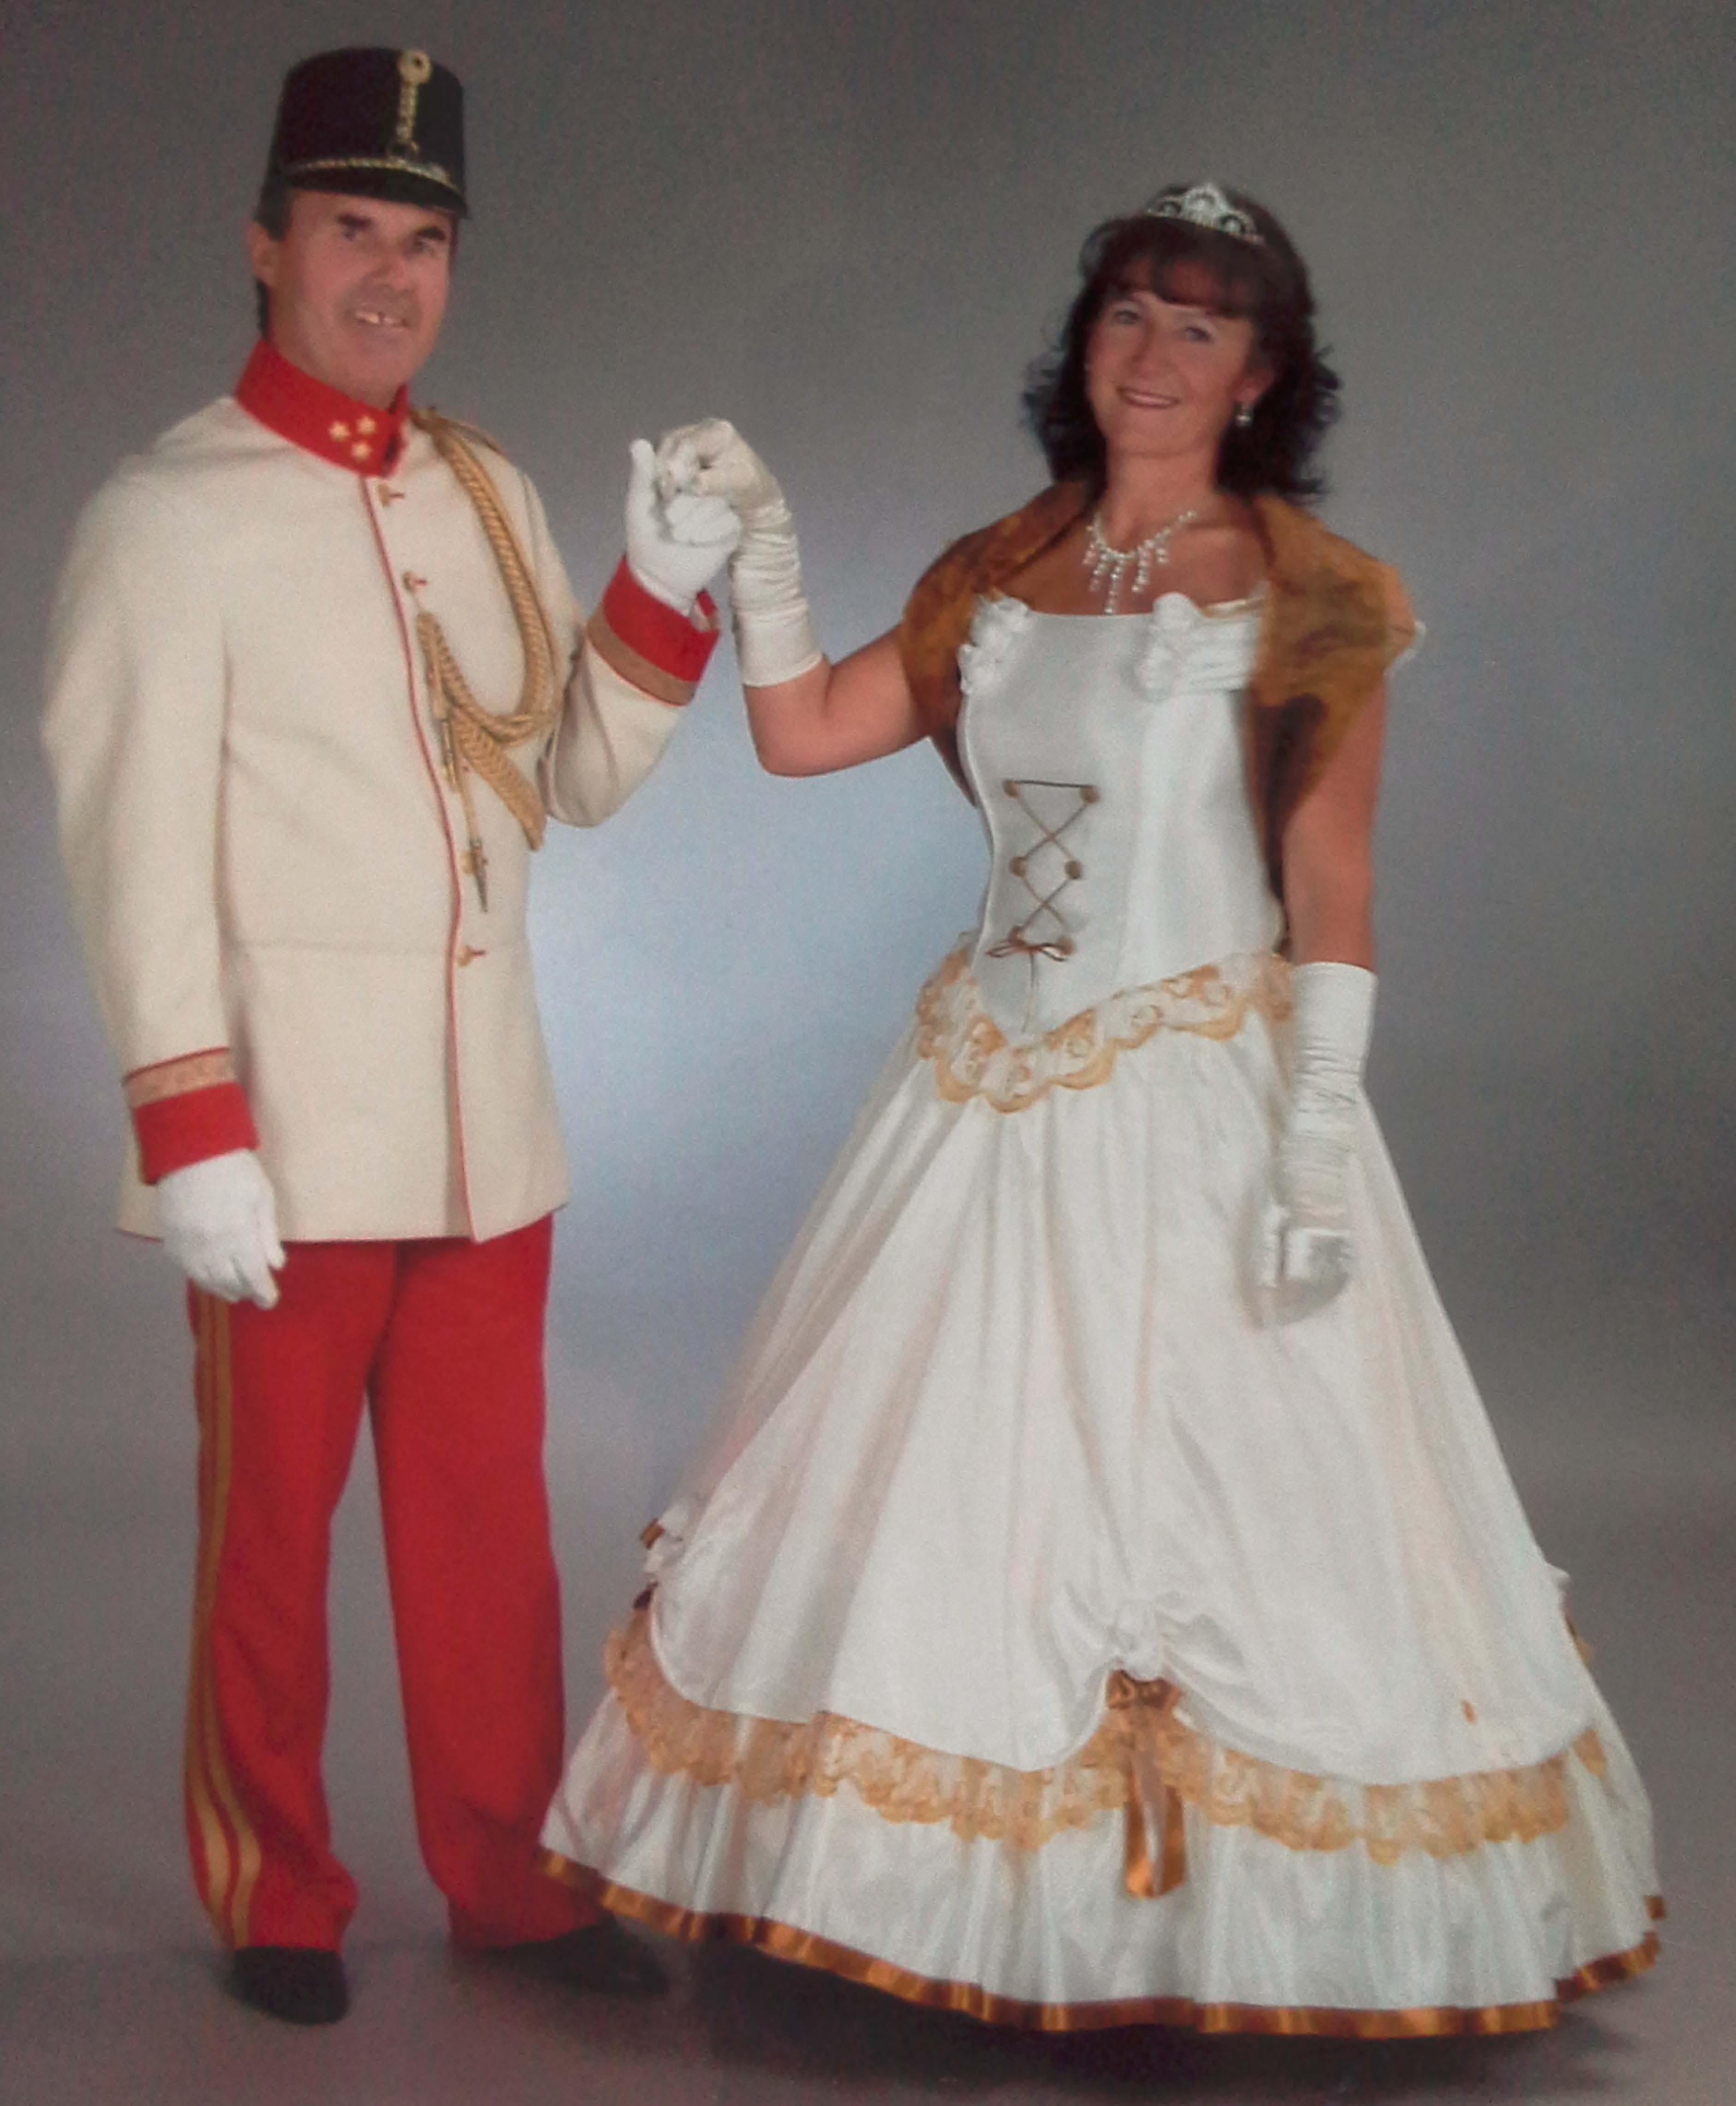 Georg I. & Marion I., Saison 2007